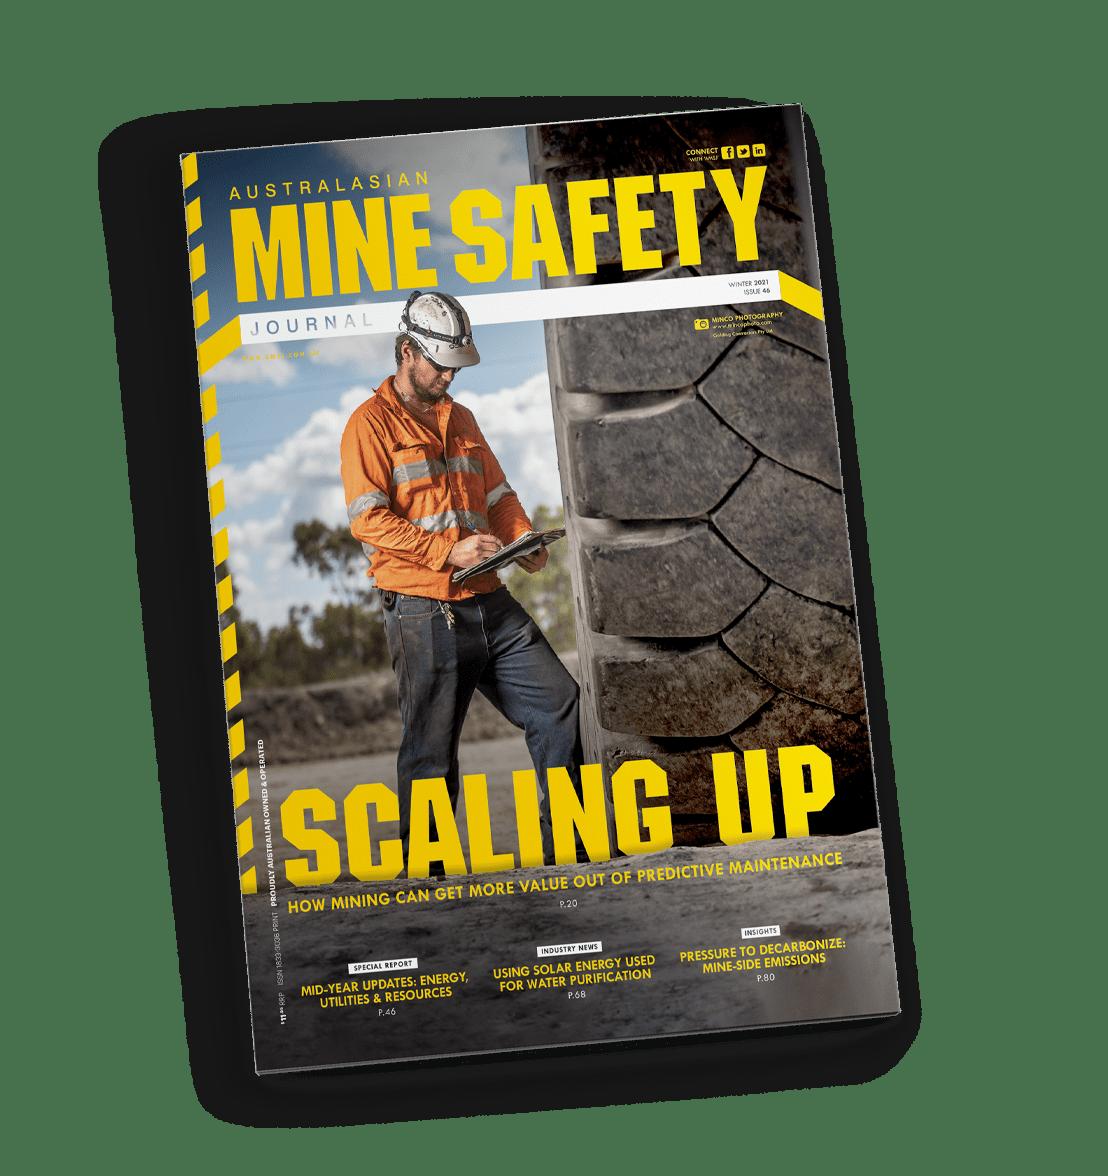 Australasian Mine Safety Journal Winter 2021